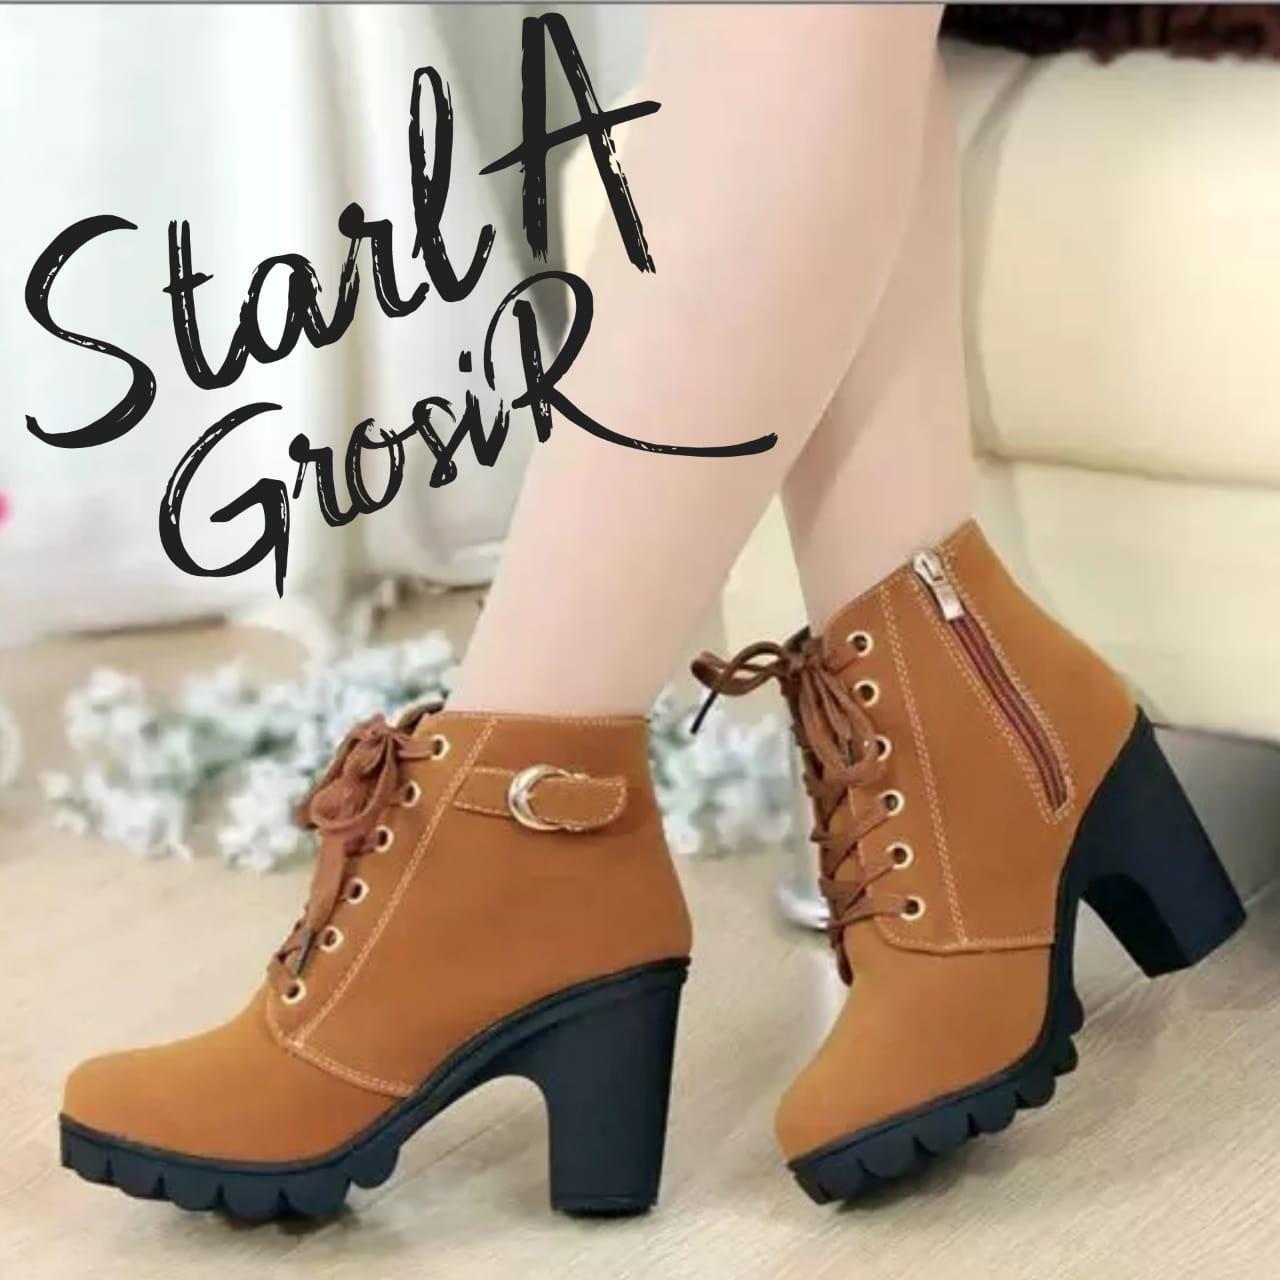 Starla Grosir - Women Fashion Boots Dn.061 By Starla Grosir.